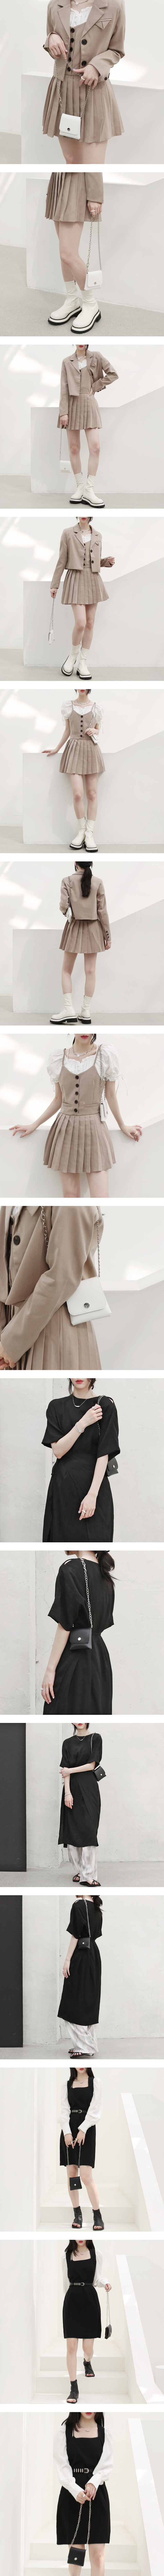 Drawing chain keyring mini bag